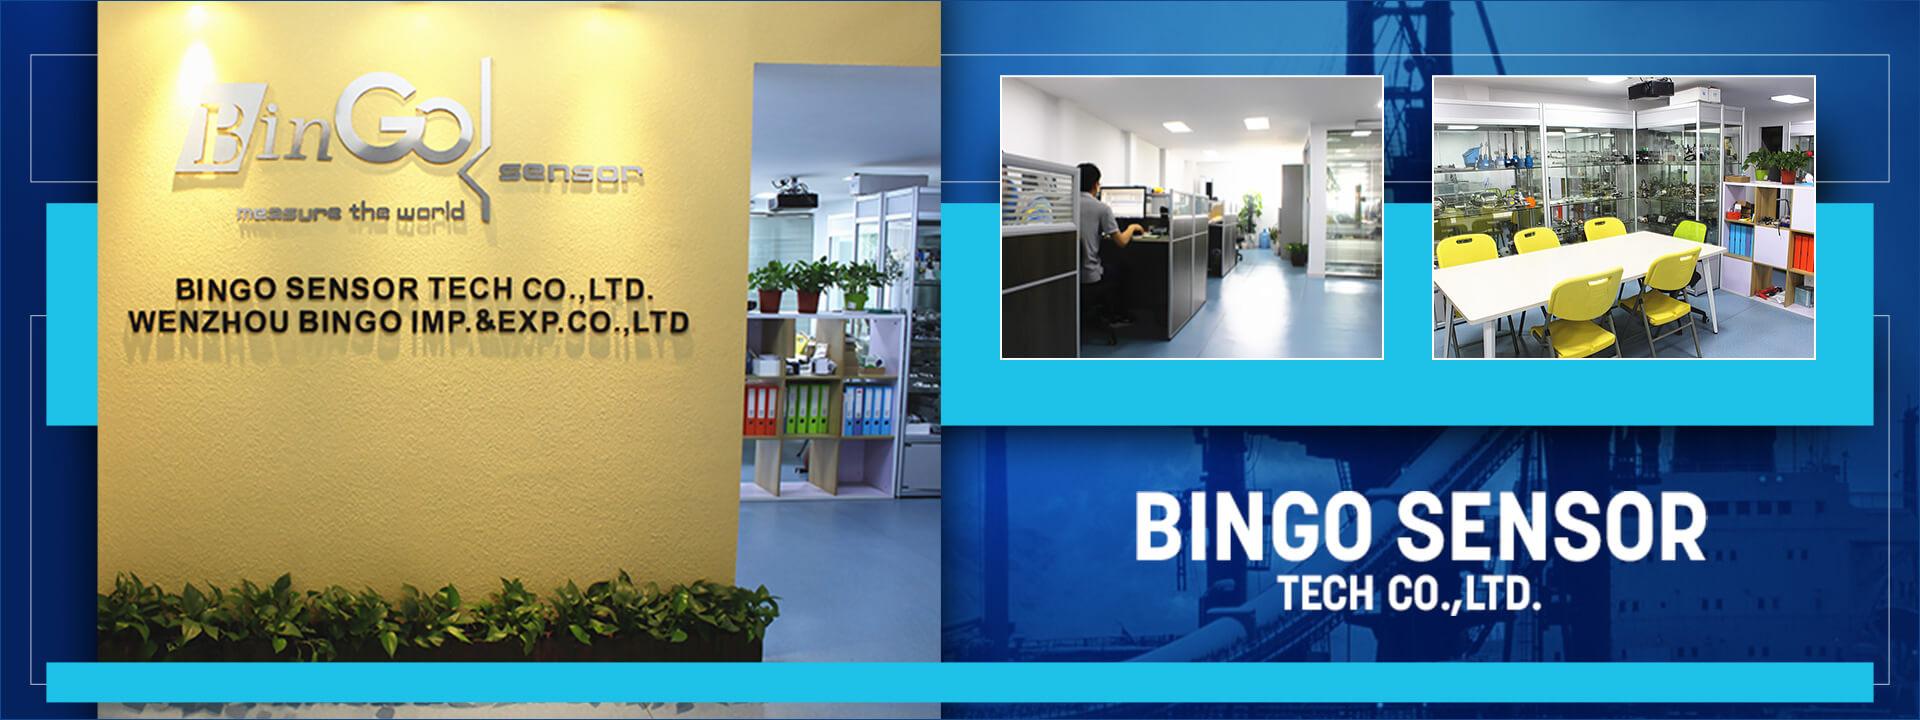 Bingo banner 02